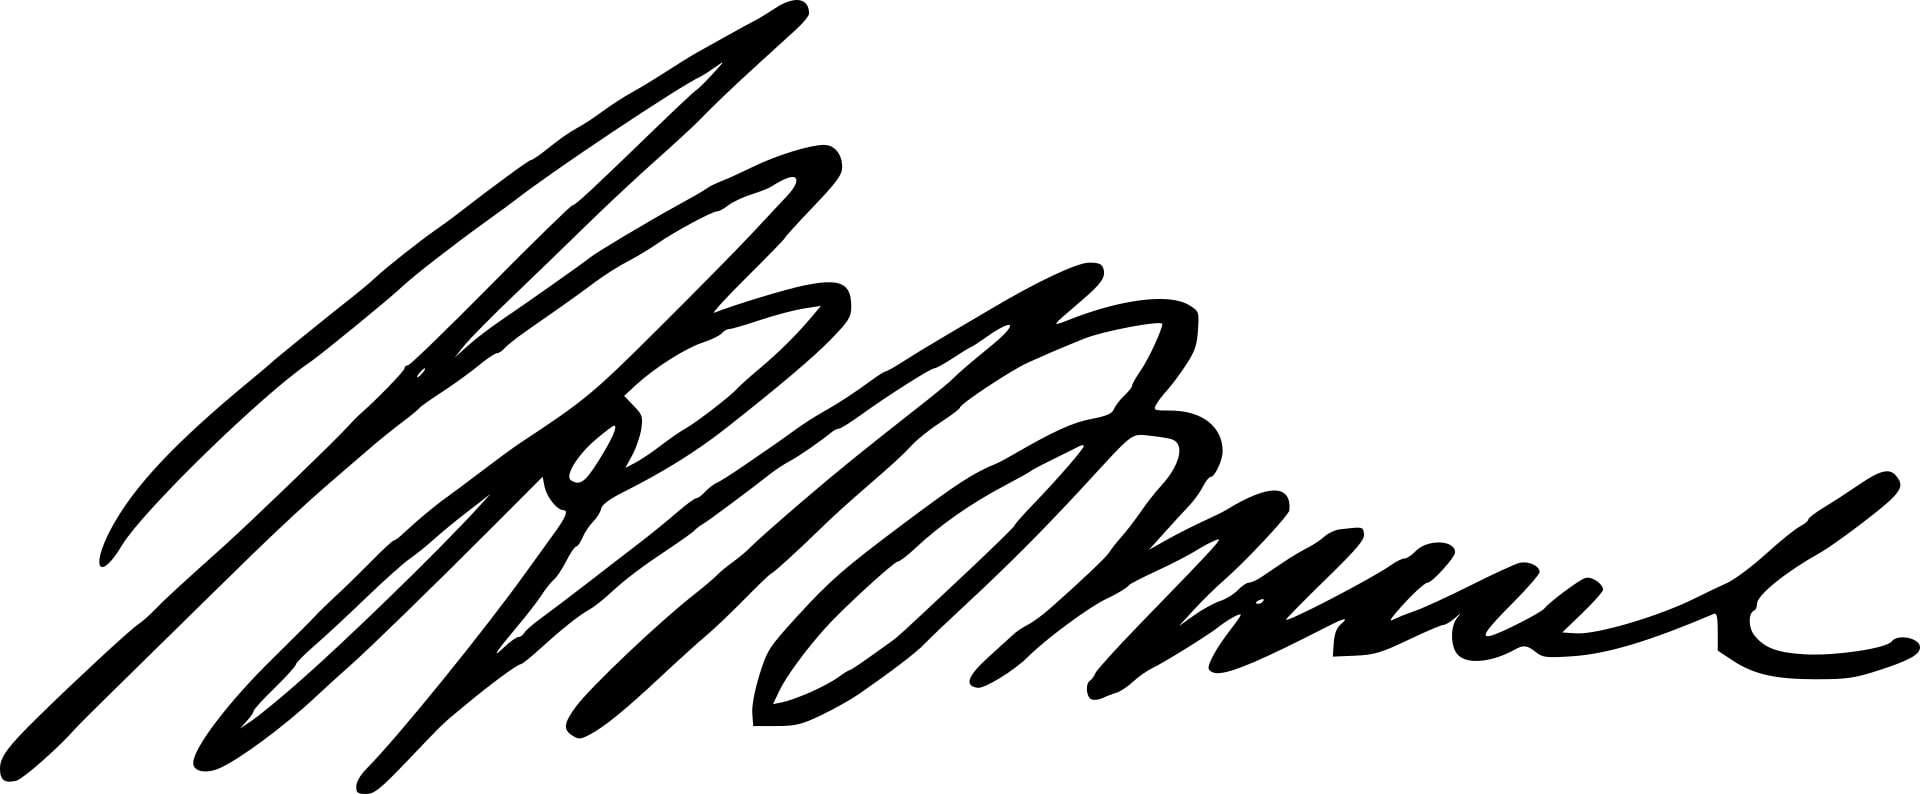 Isambard Kingdom Brunel Signature